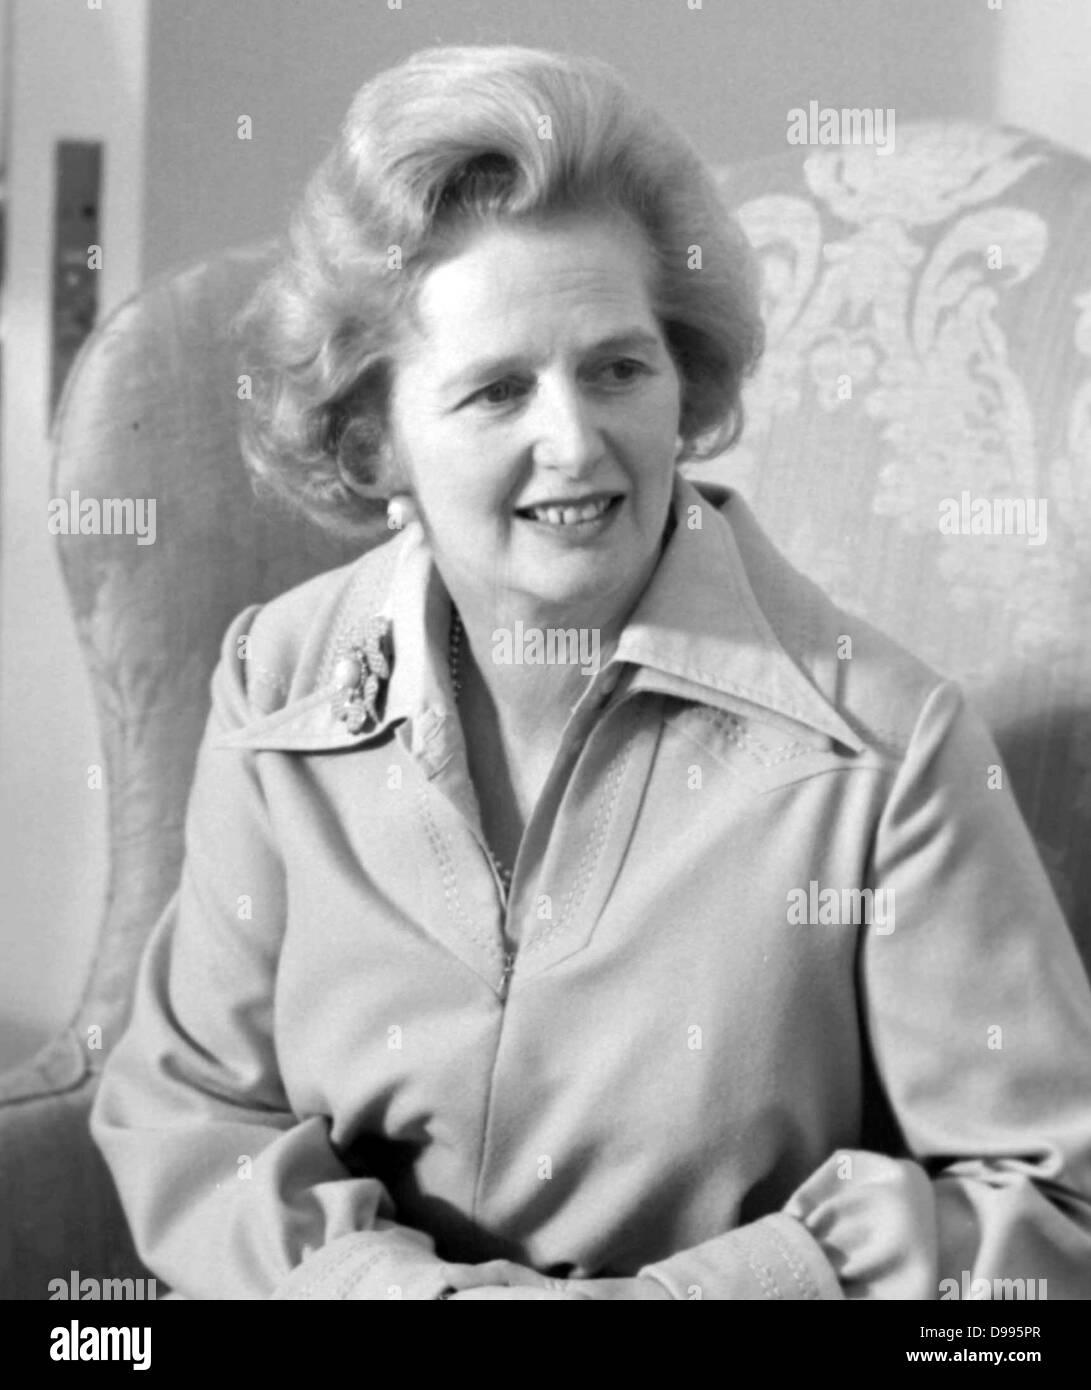 Margaret Thatcher, British Prime Minister 1979-1990 - Stock Image